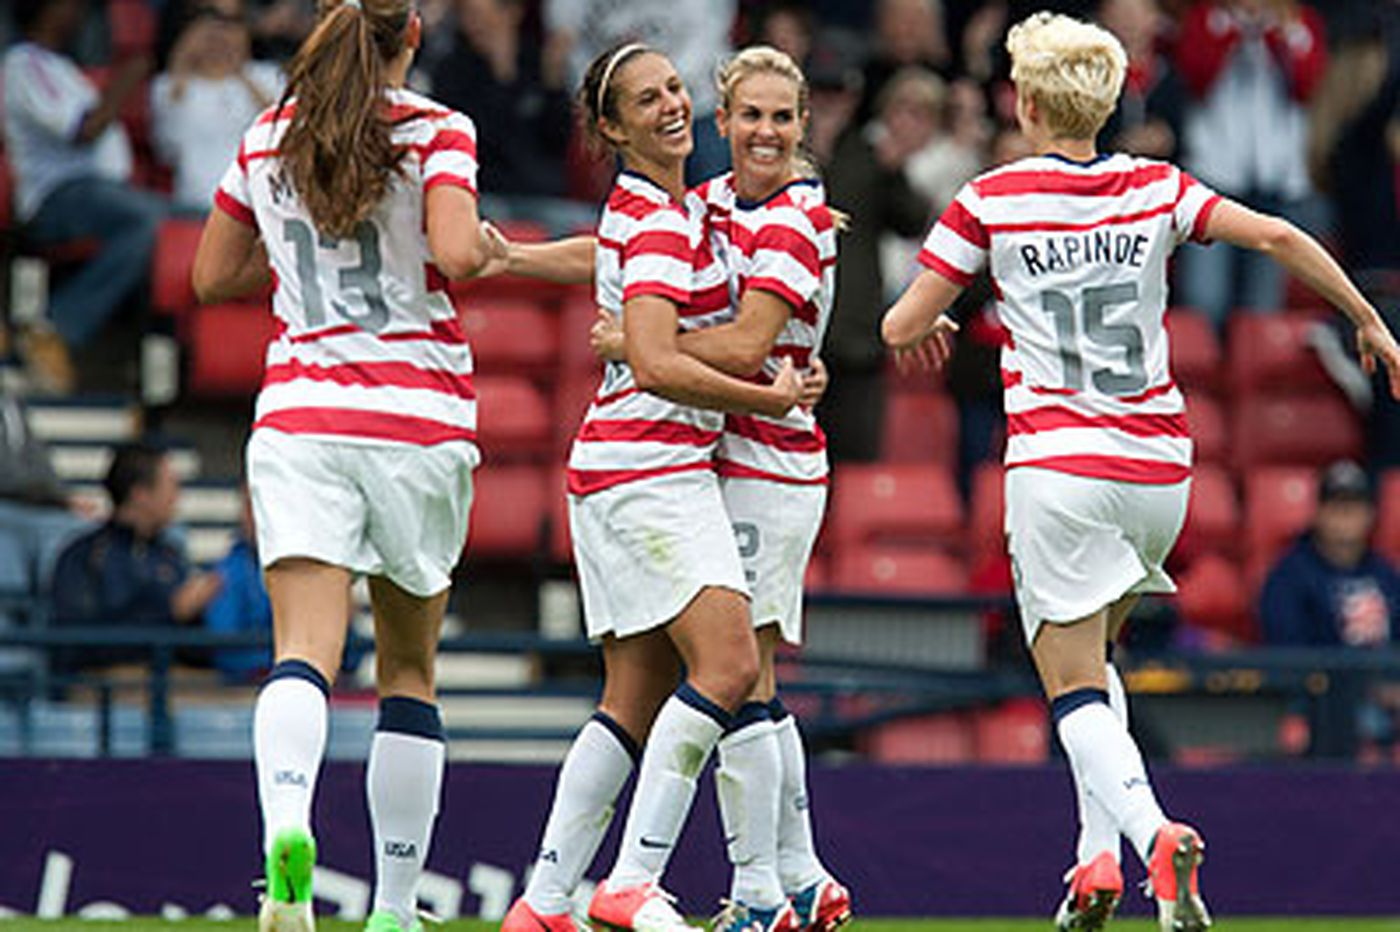 Carli Lloyd's Olympics Journal: U.S. women's soccer team perfect in group stage play so far